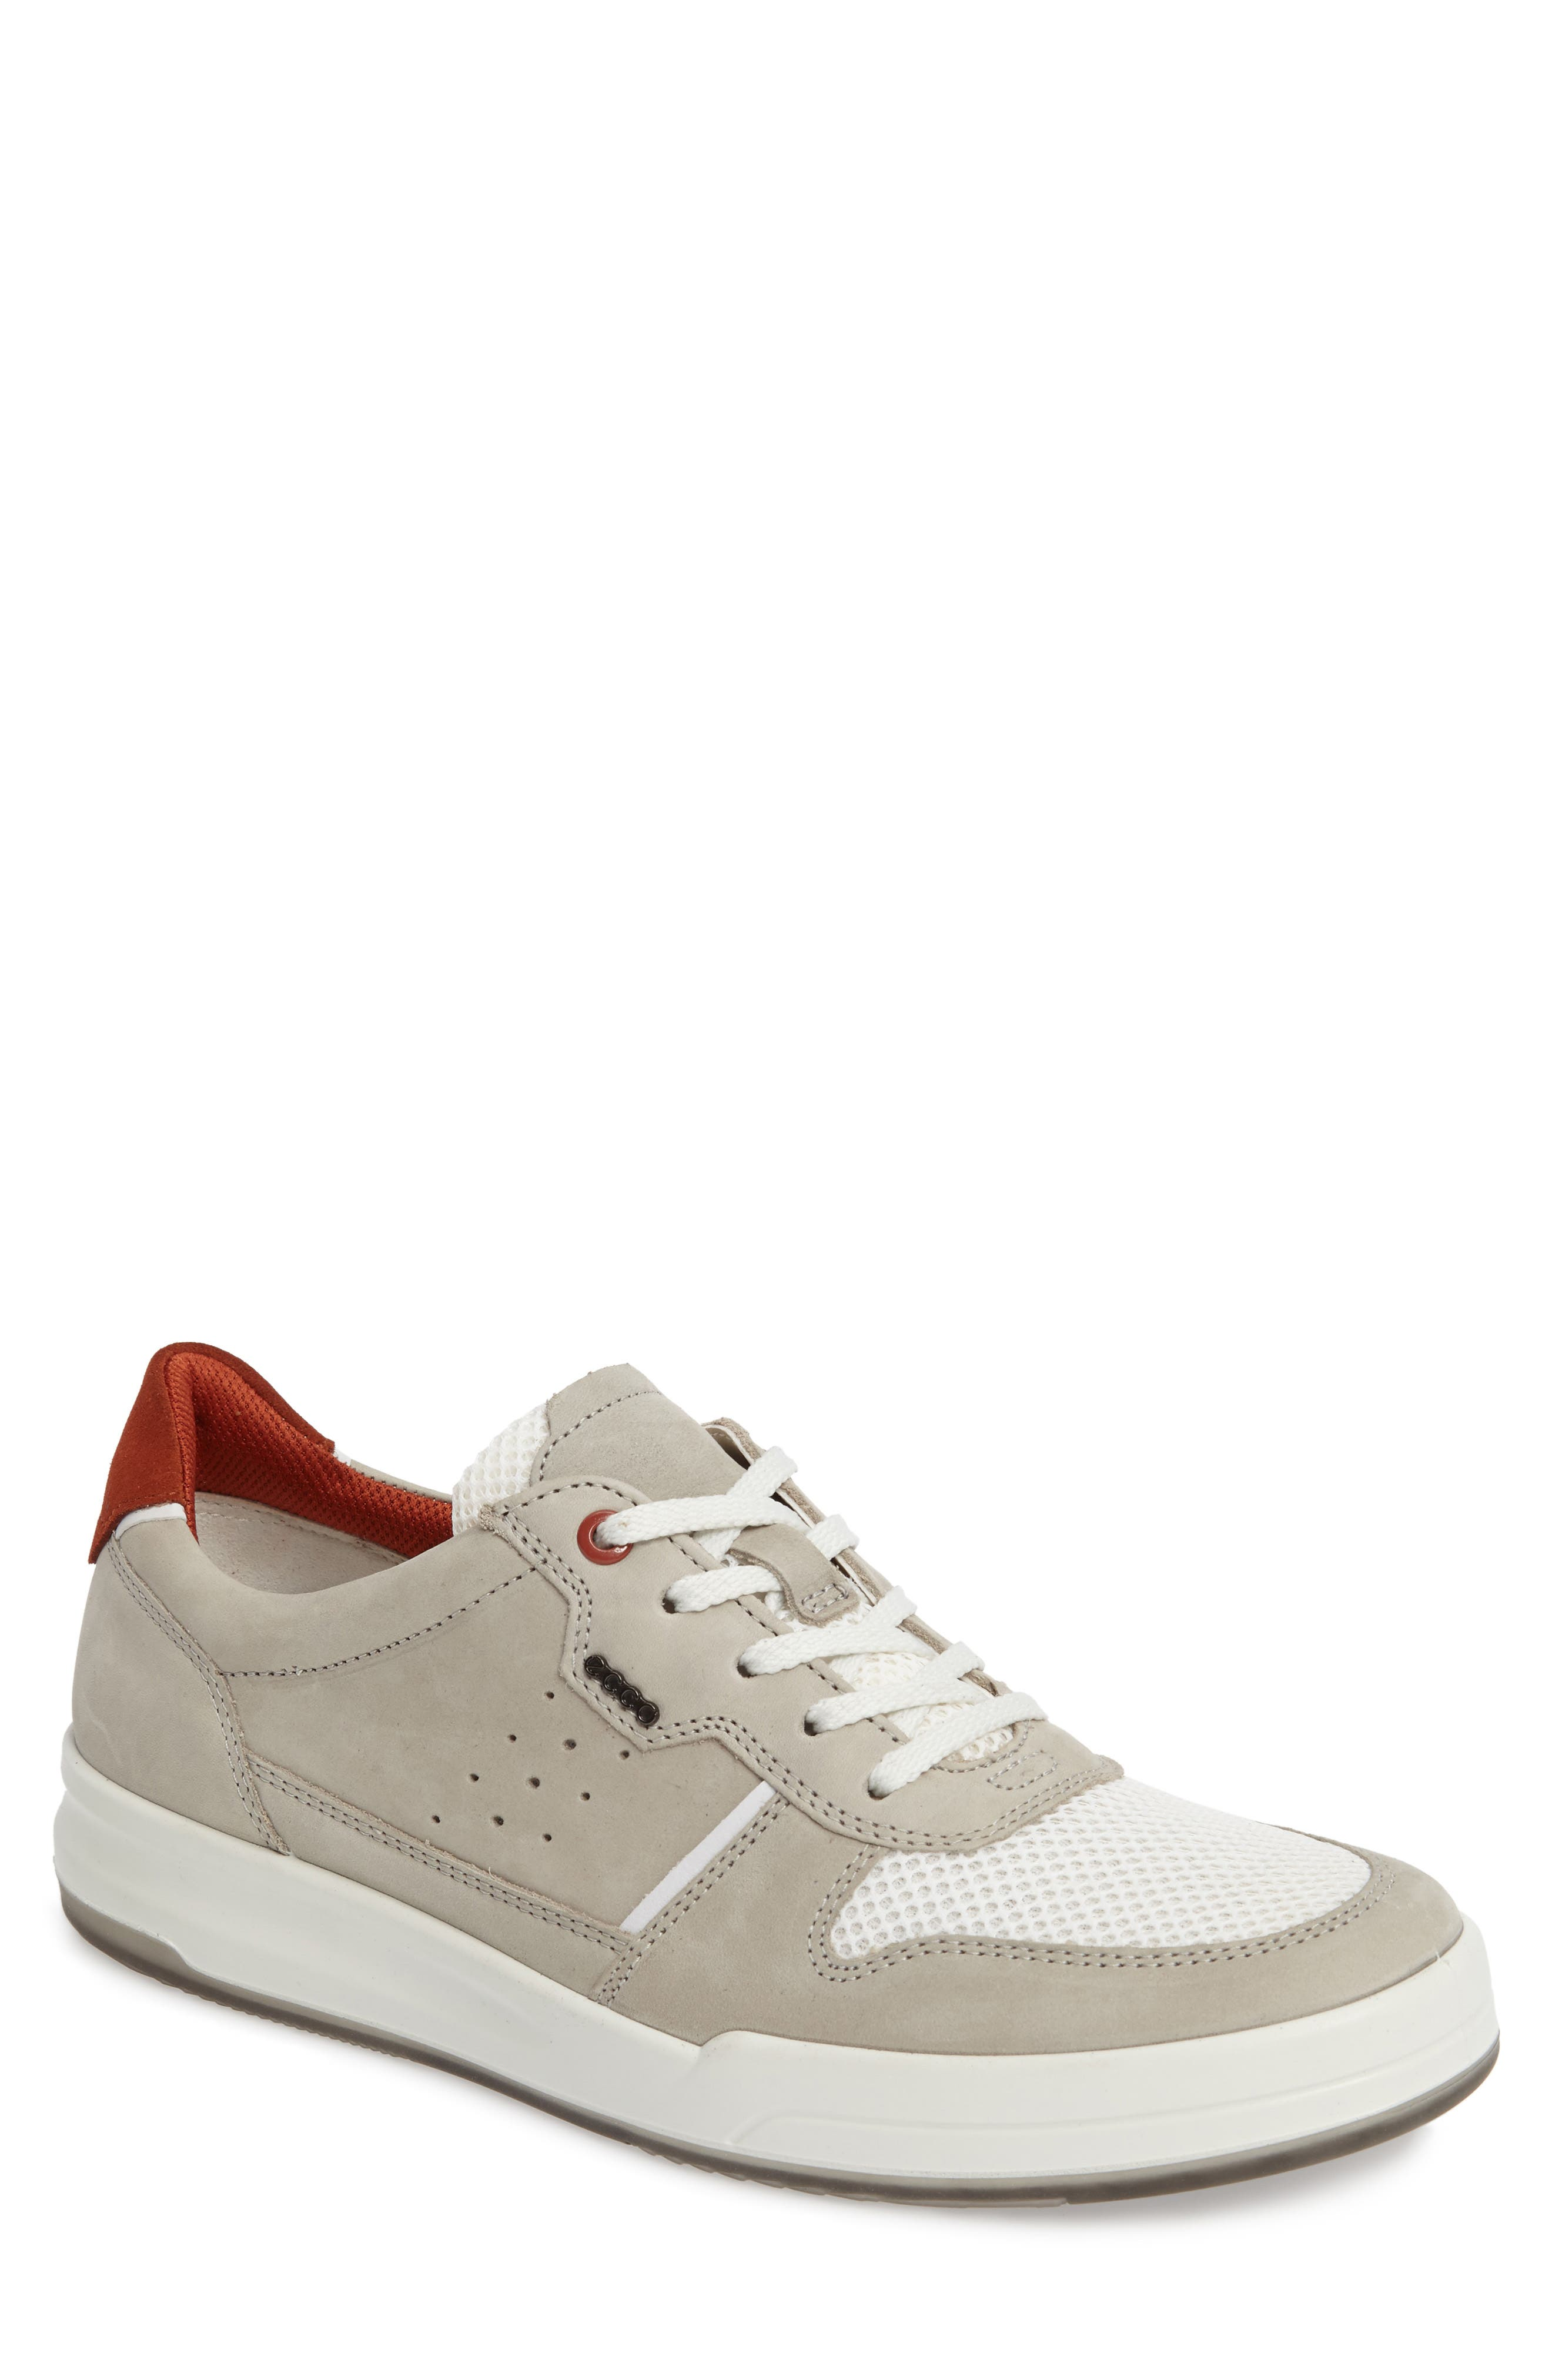 Jack Sneaker,                         Main,                         color, 053